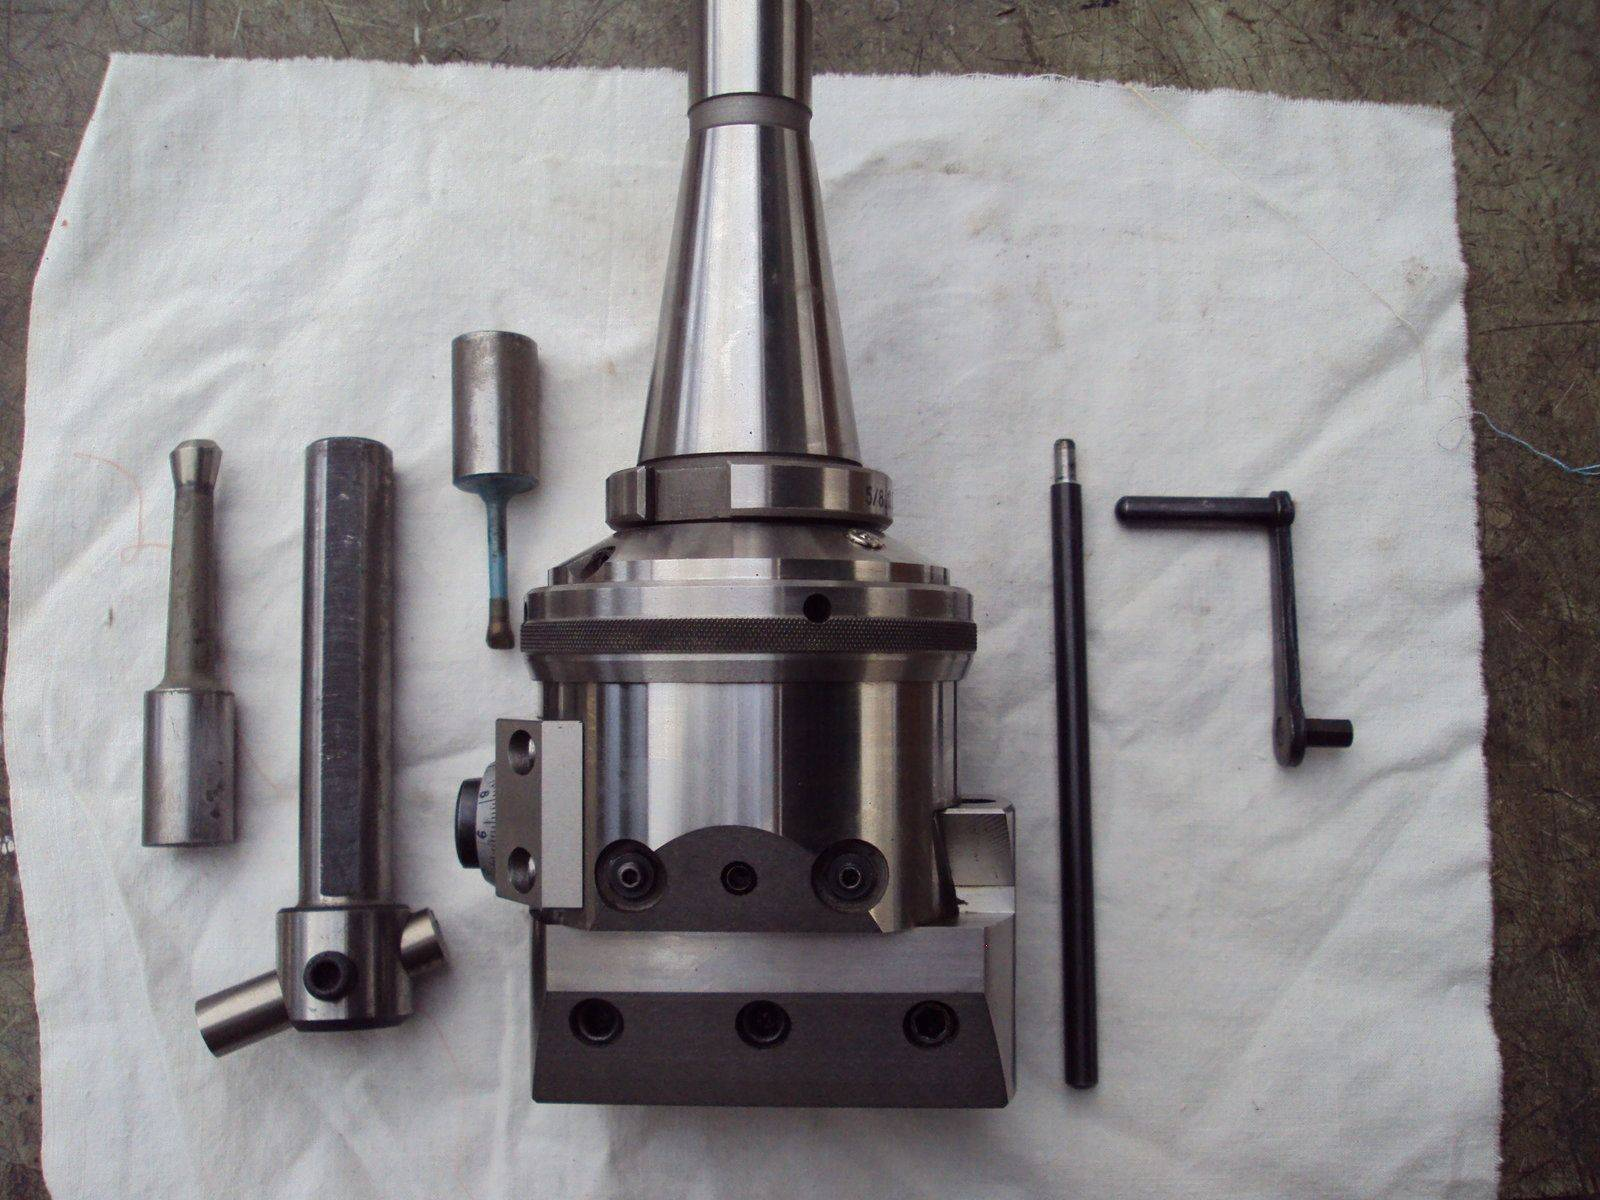 DSC06187.JPG